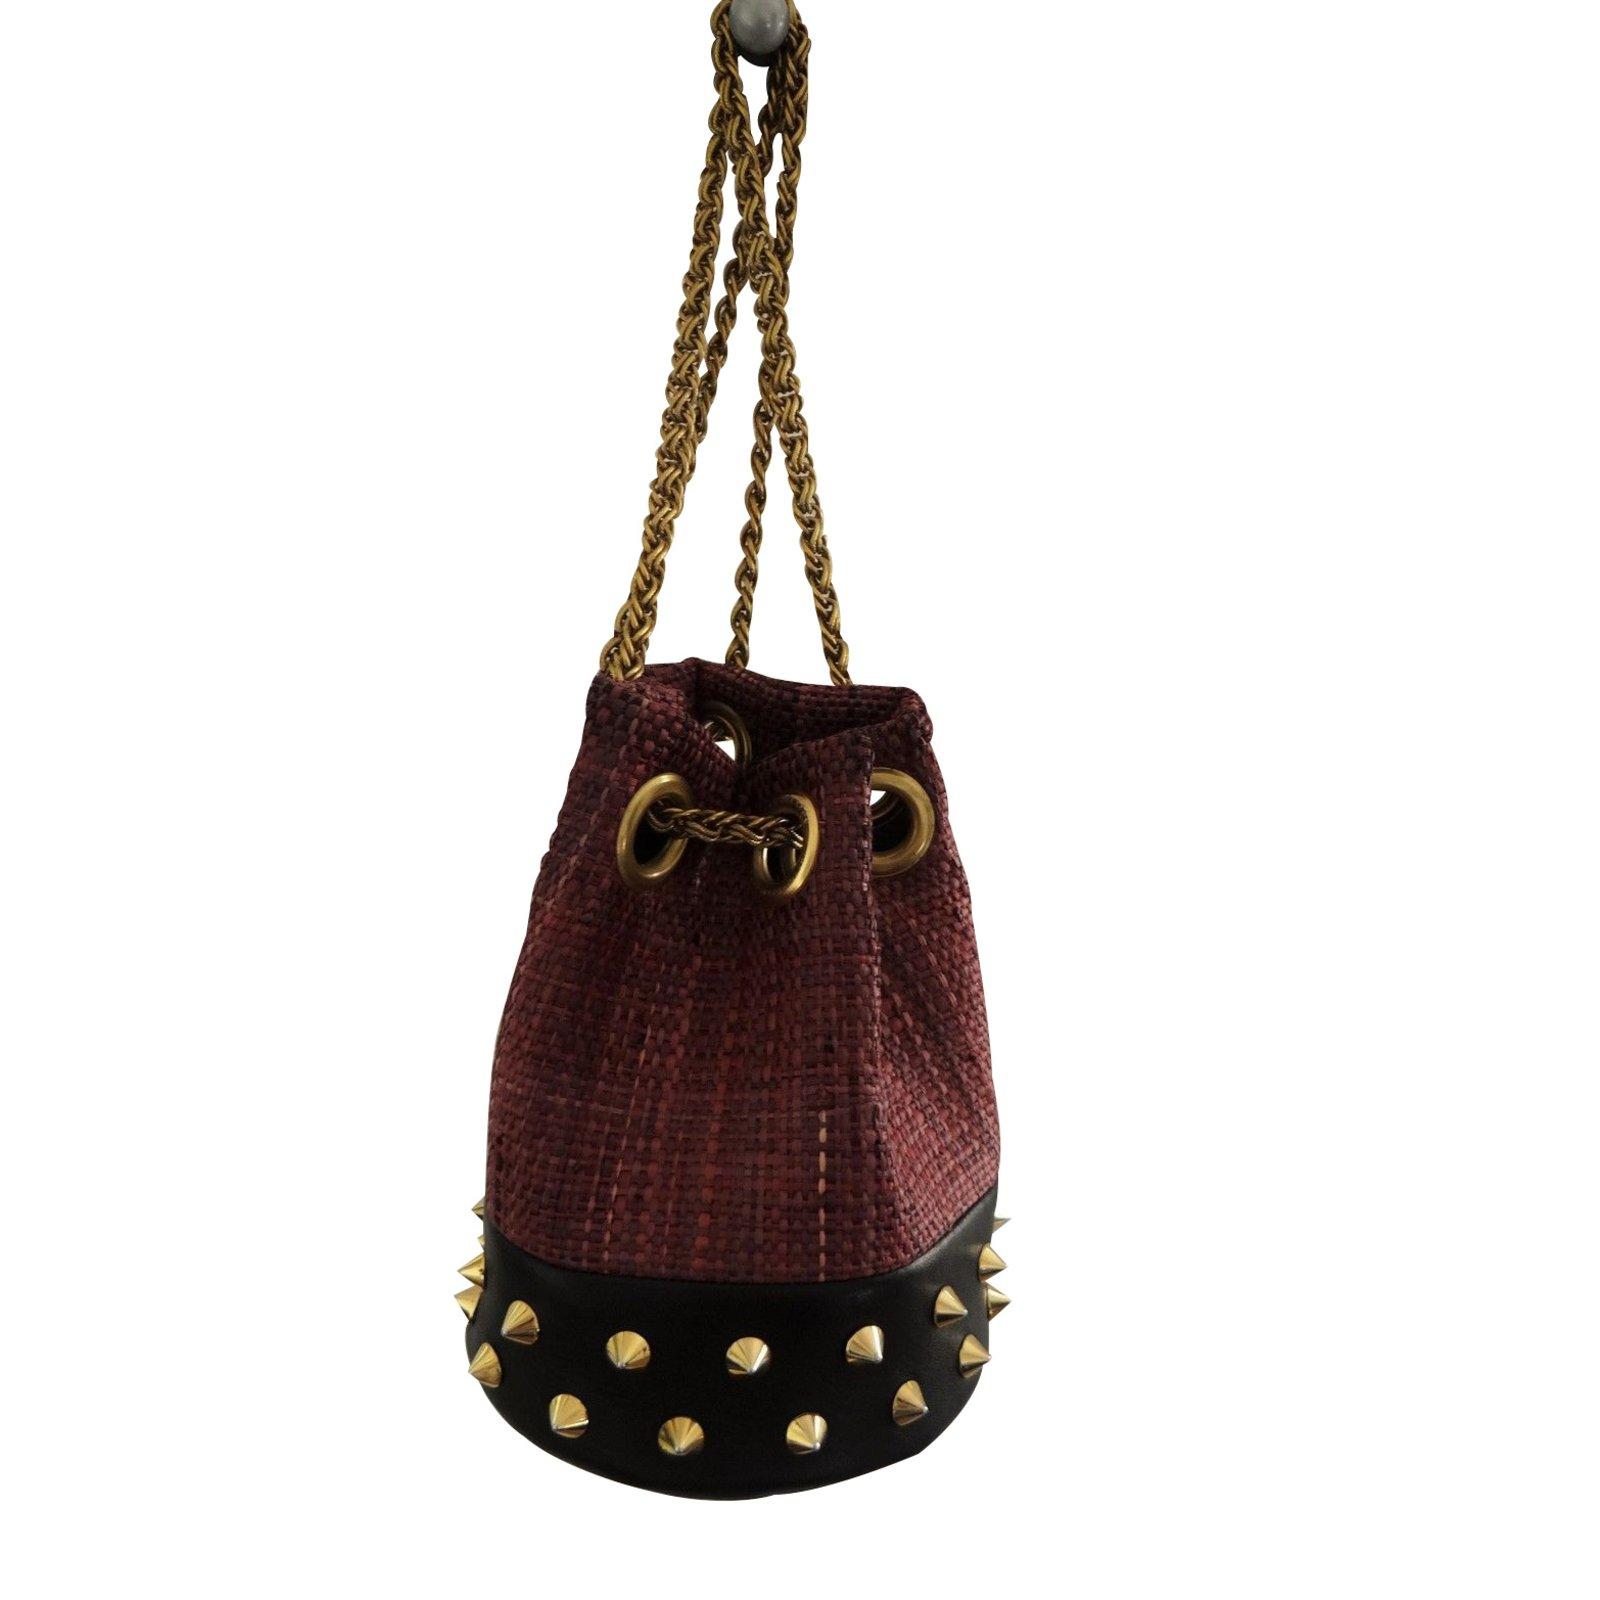 sacs main delphine delafon sacs main paille prune joli closet. Black Bedroom Furniture Sets. Home Design Ideas